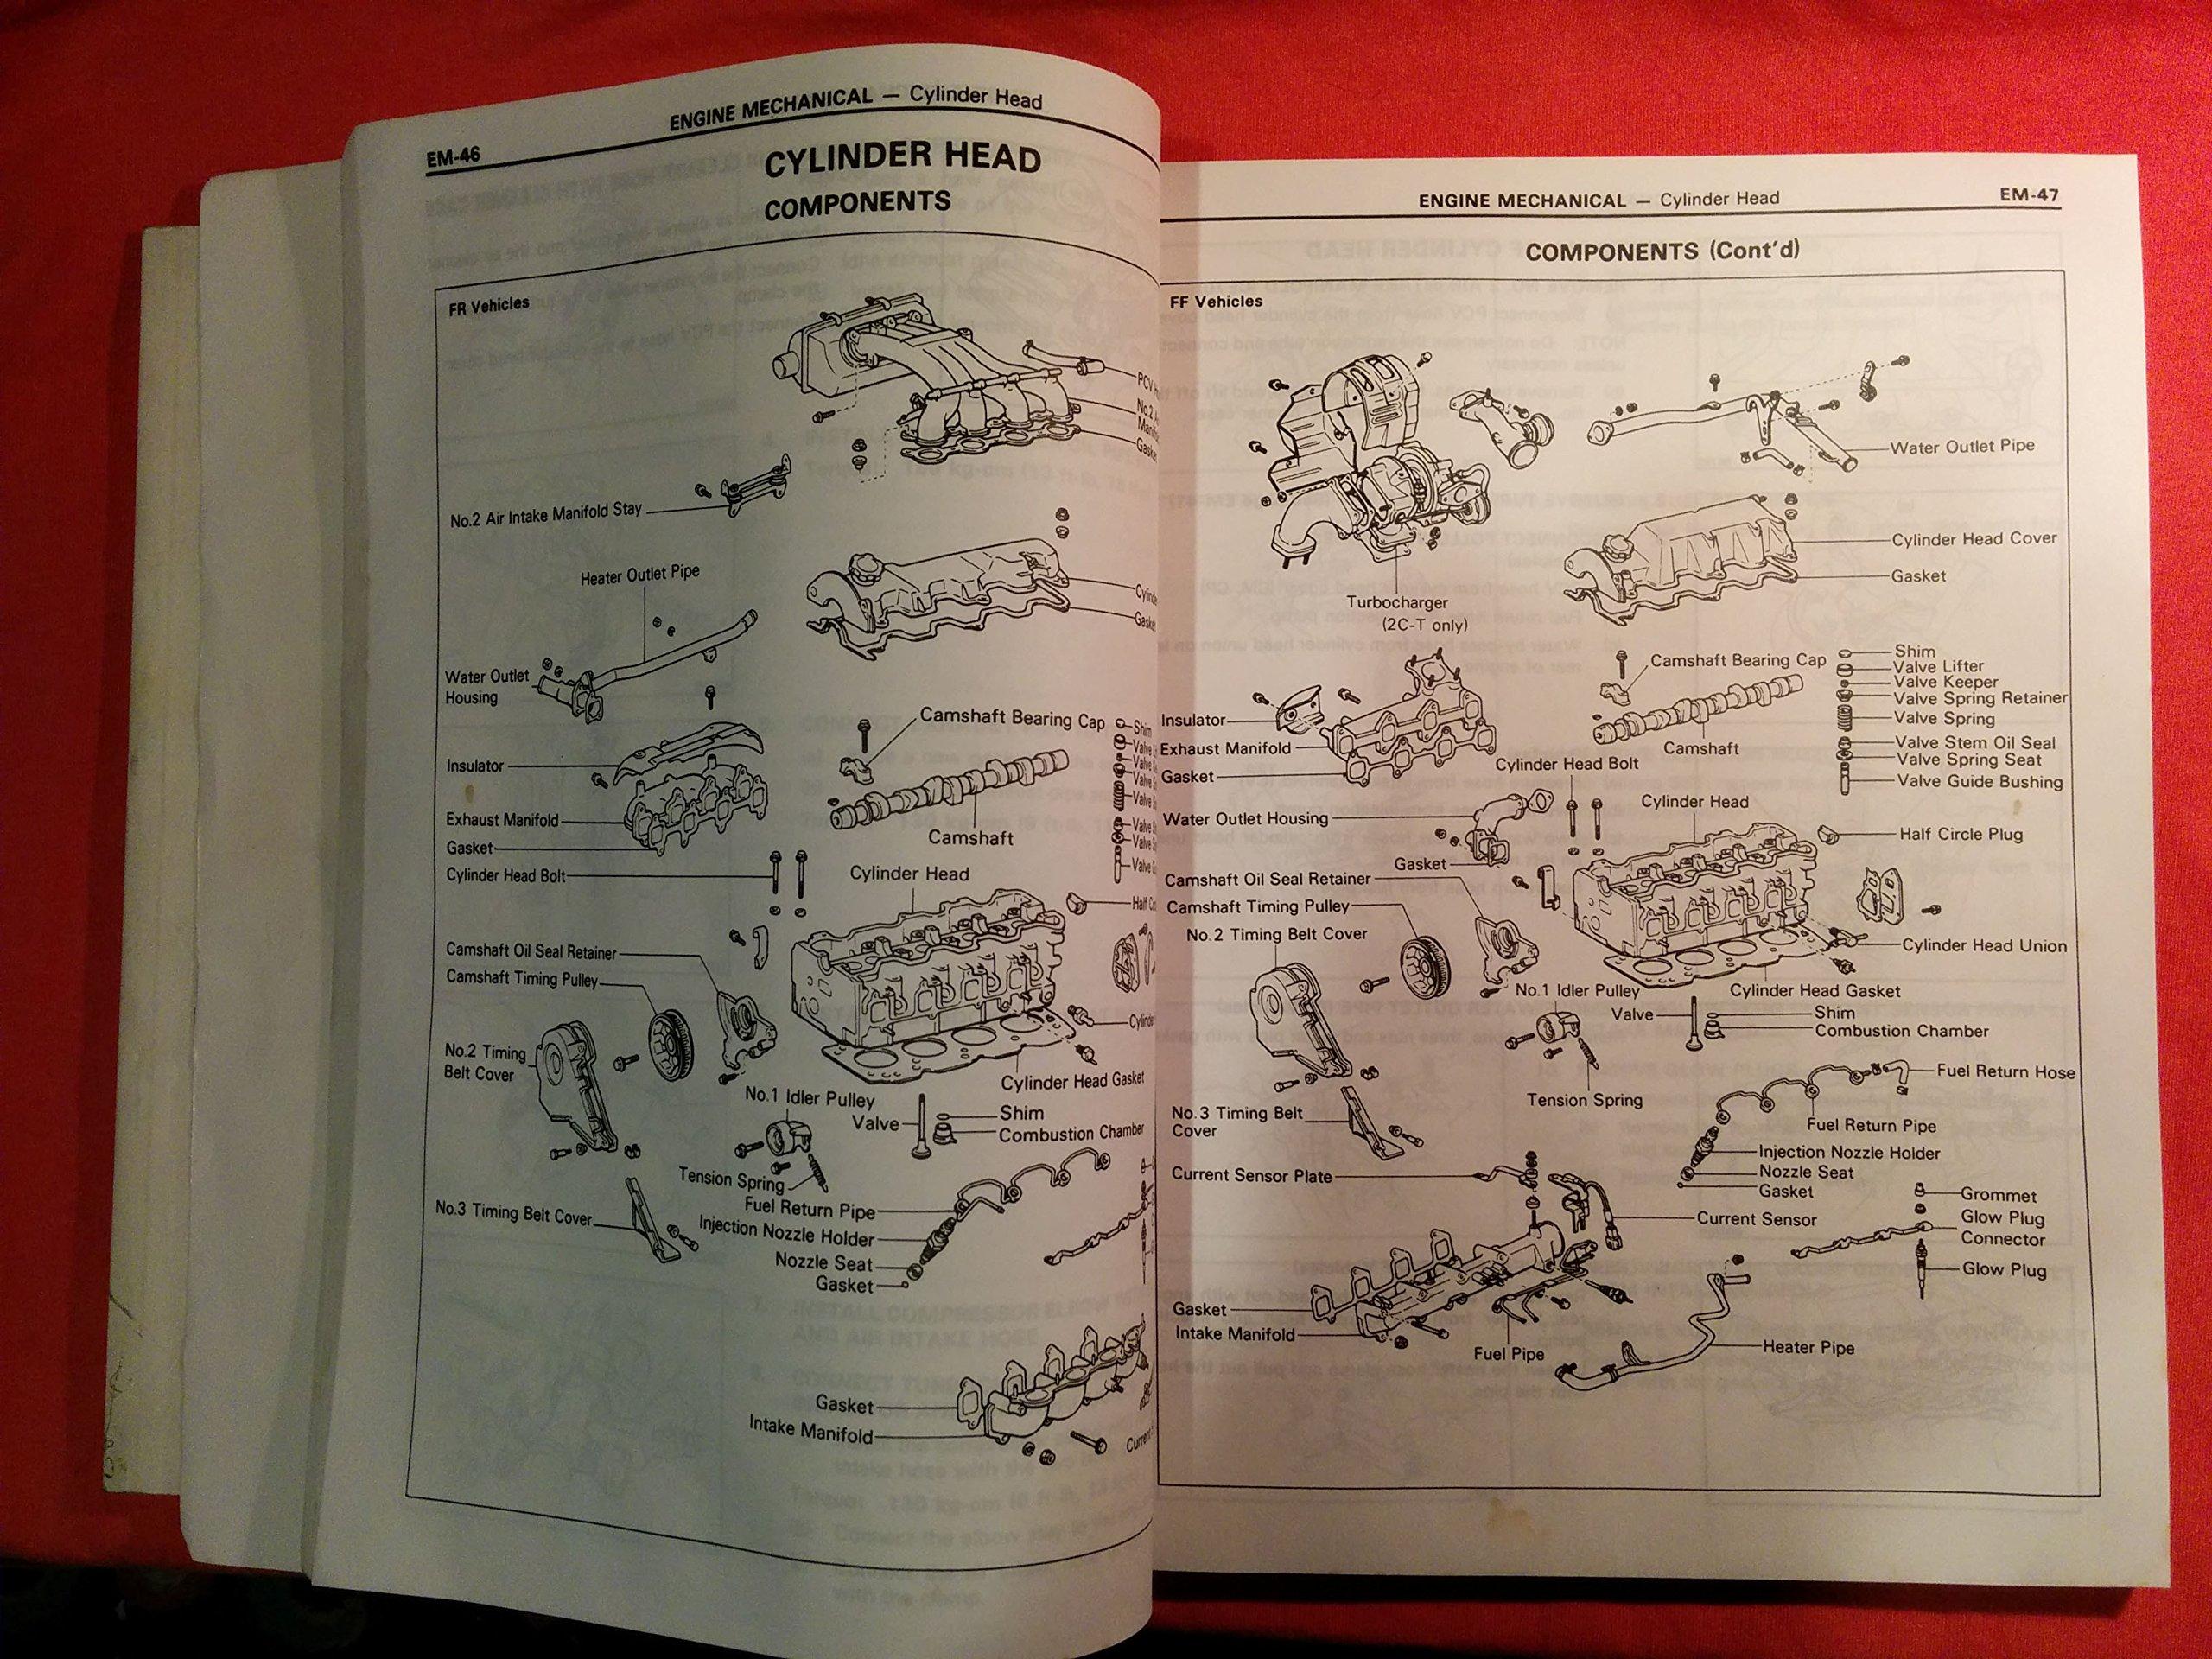 Toyota 1C, 2C, 2C-T Engine Repair Manual: Amazon.co.uk: Toyota Motor  Corporation: Books